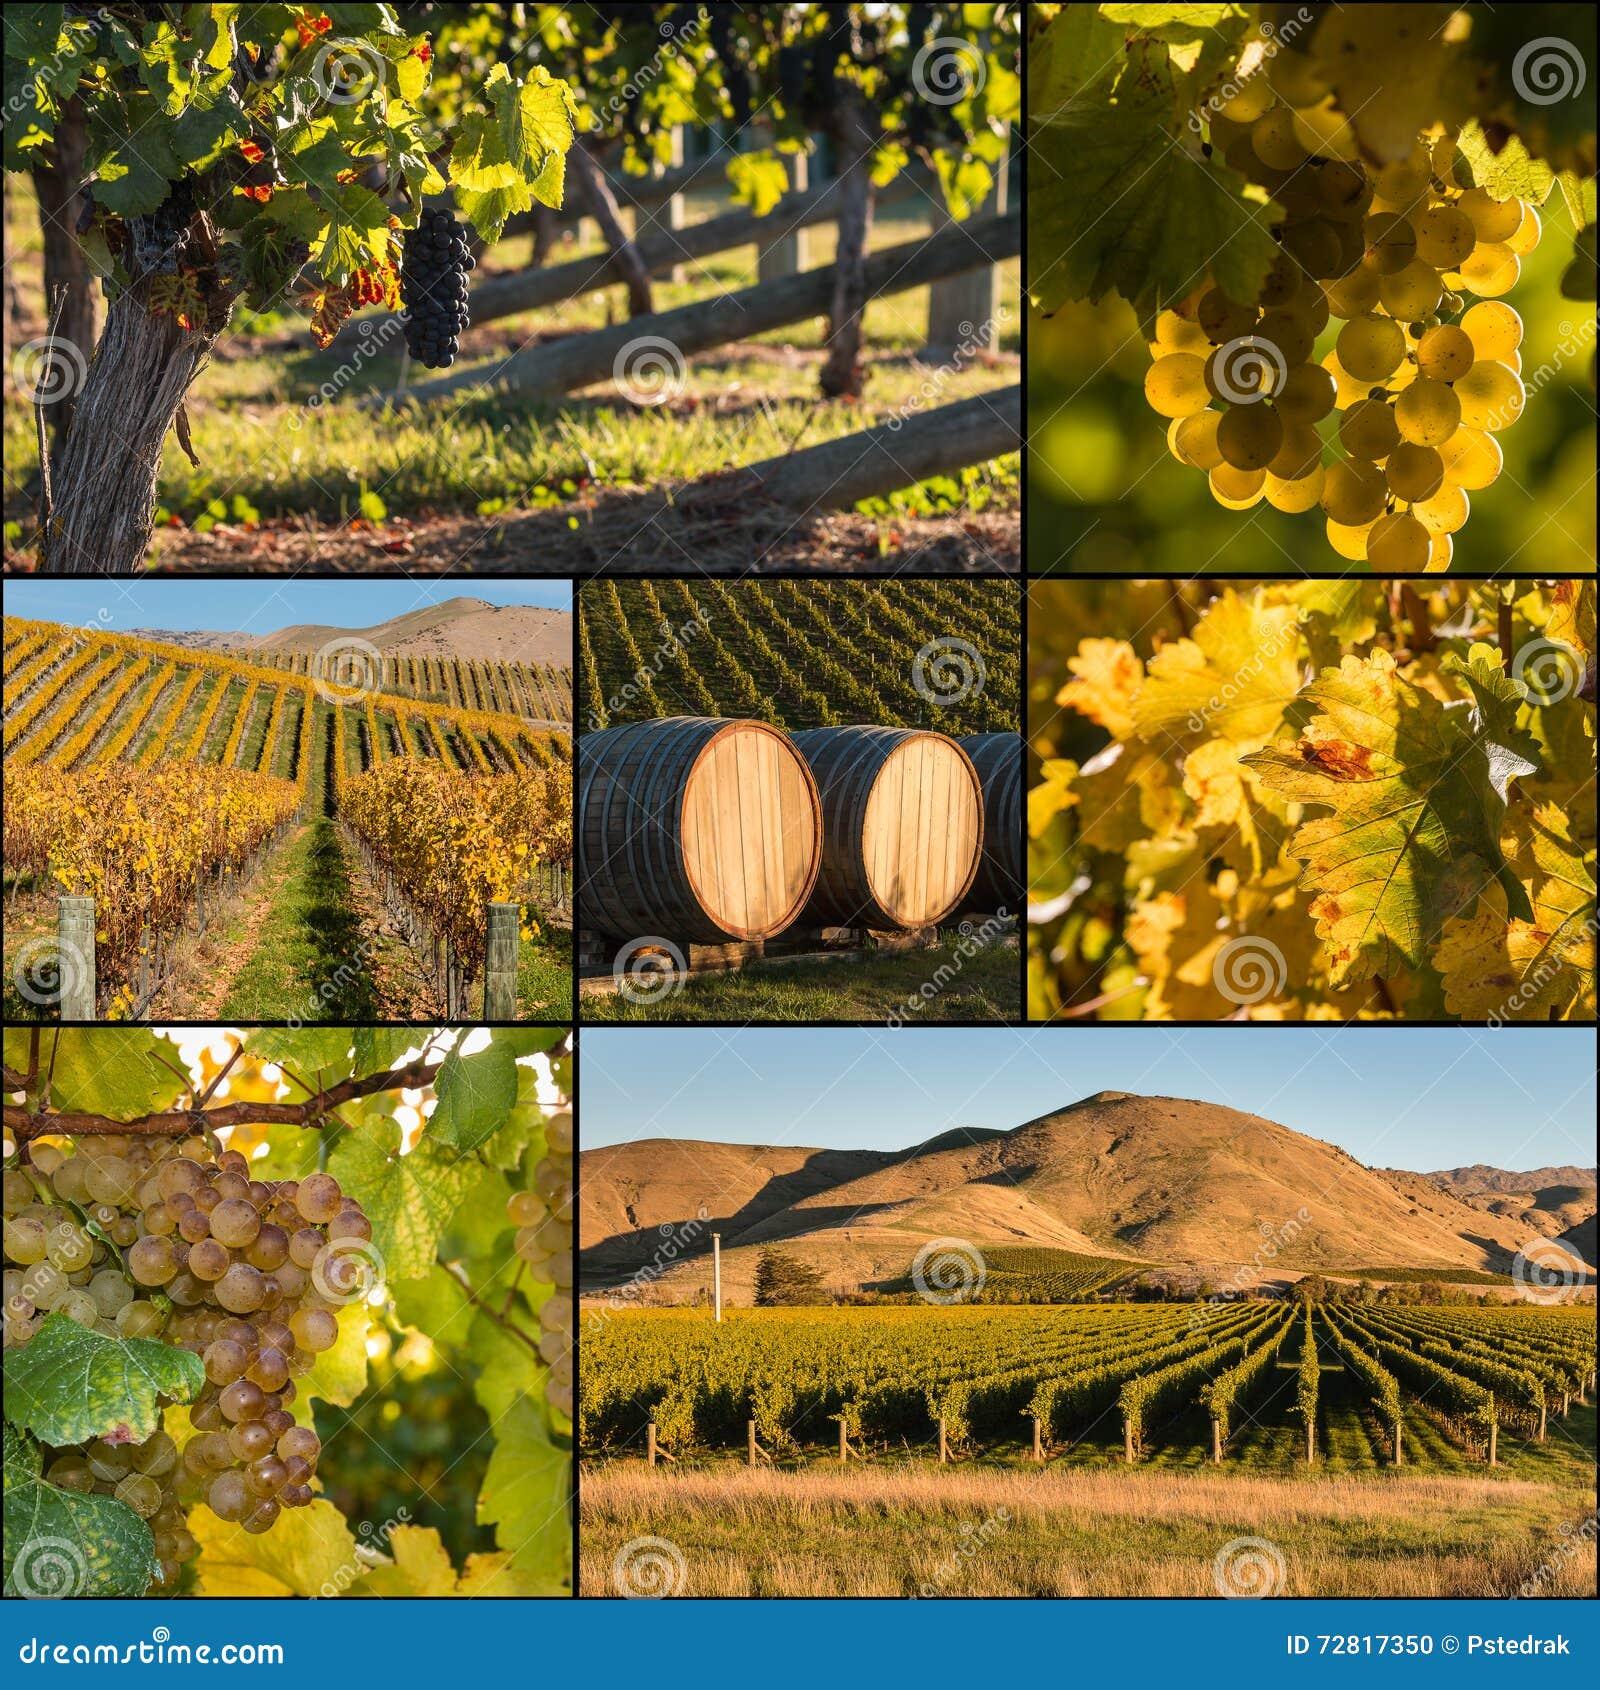 New Zealand vineyards at harvest